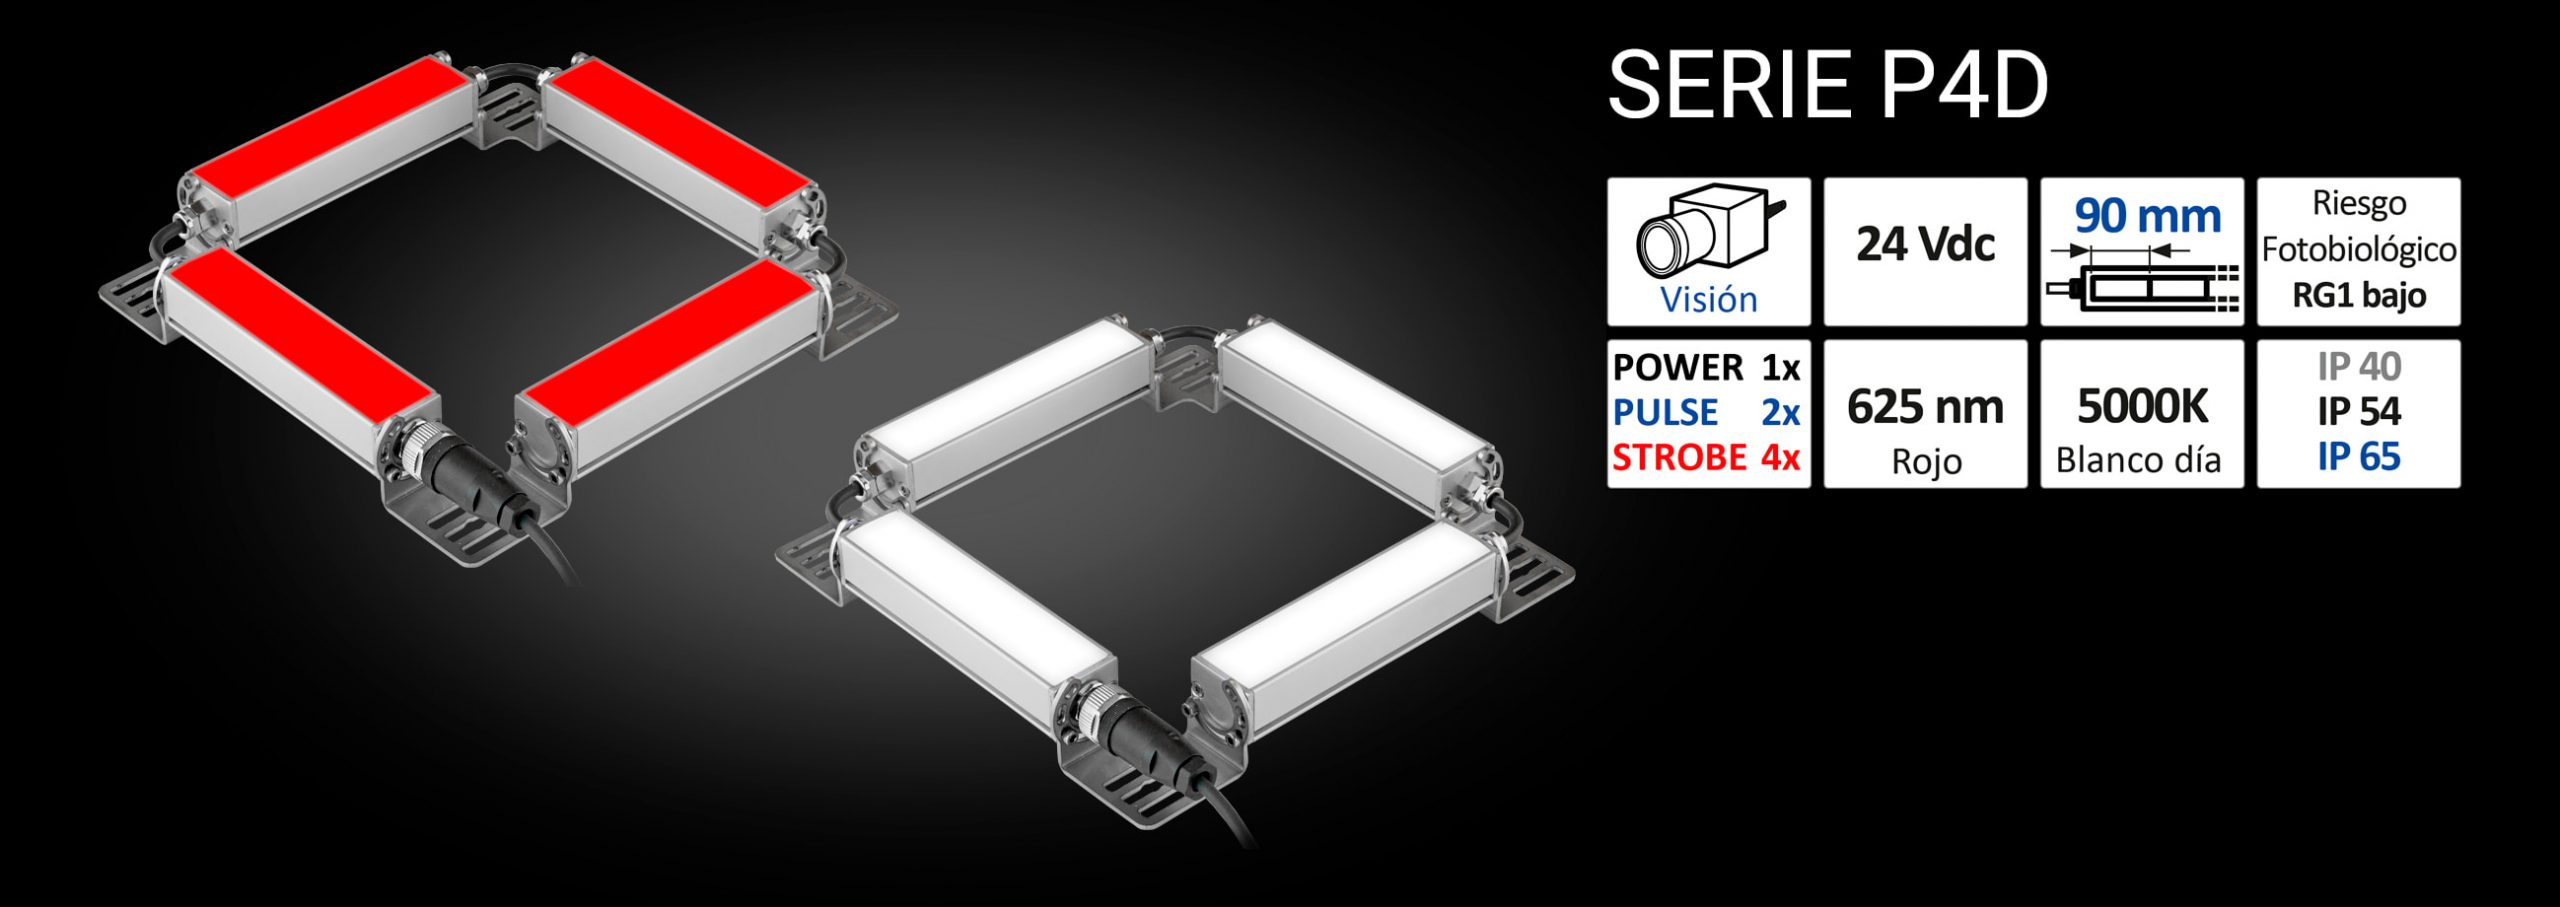 serie_p4d_slider_2x_1-scaled